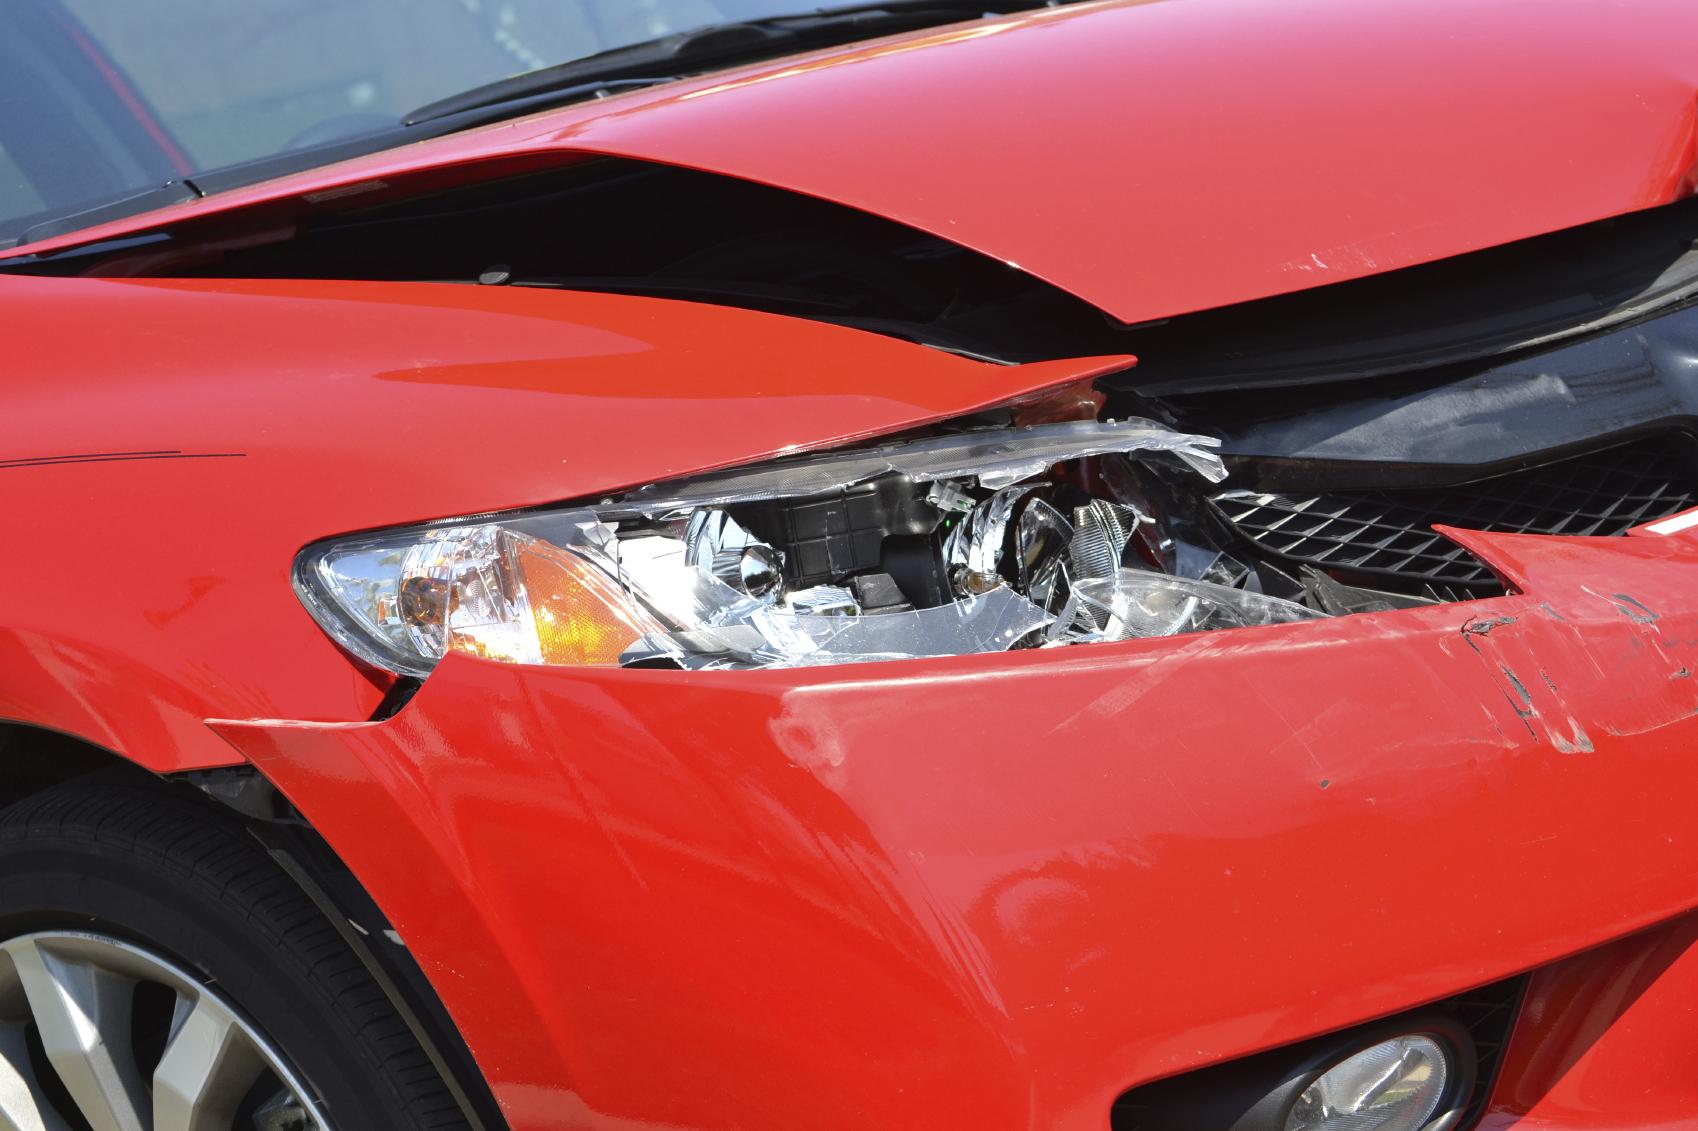 Automotive Scratch Repair in Frankfort, IL